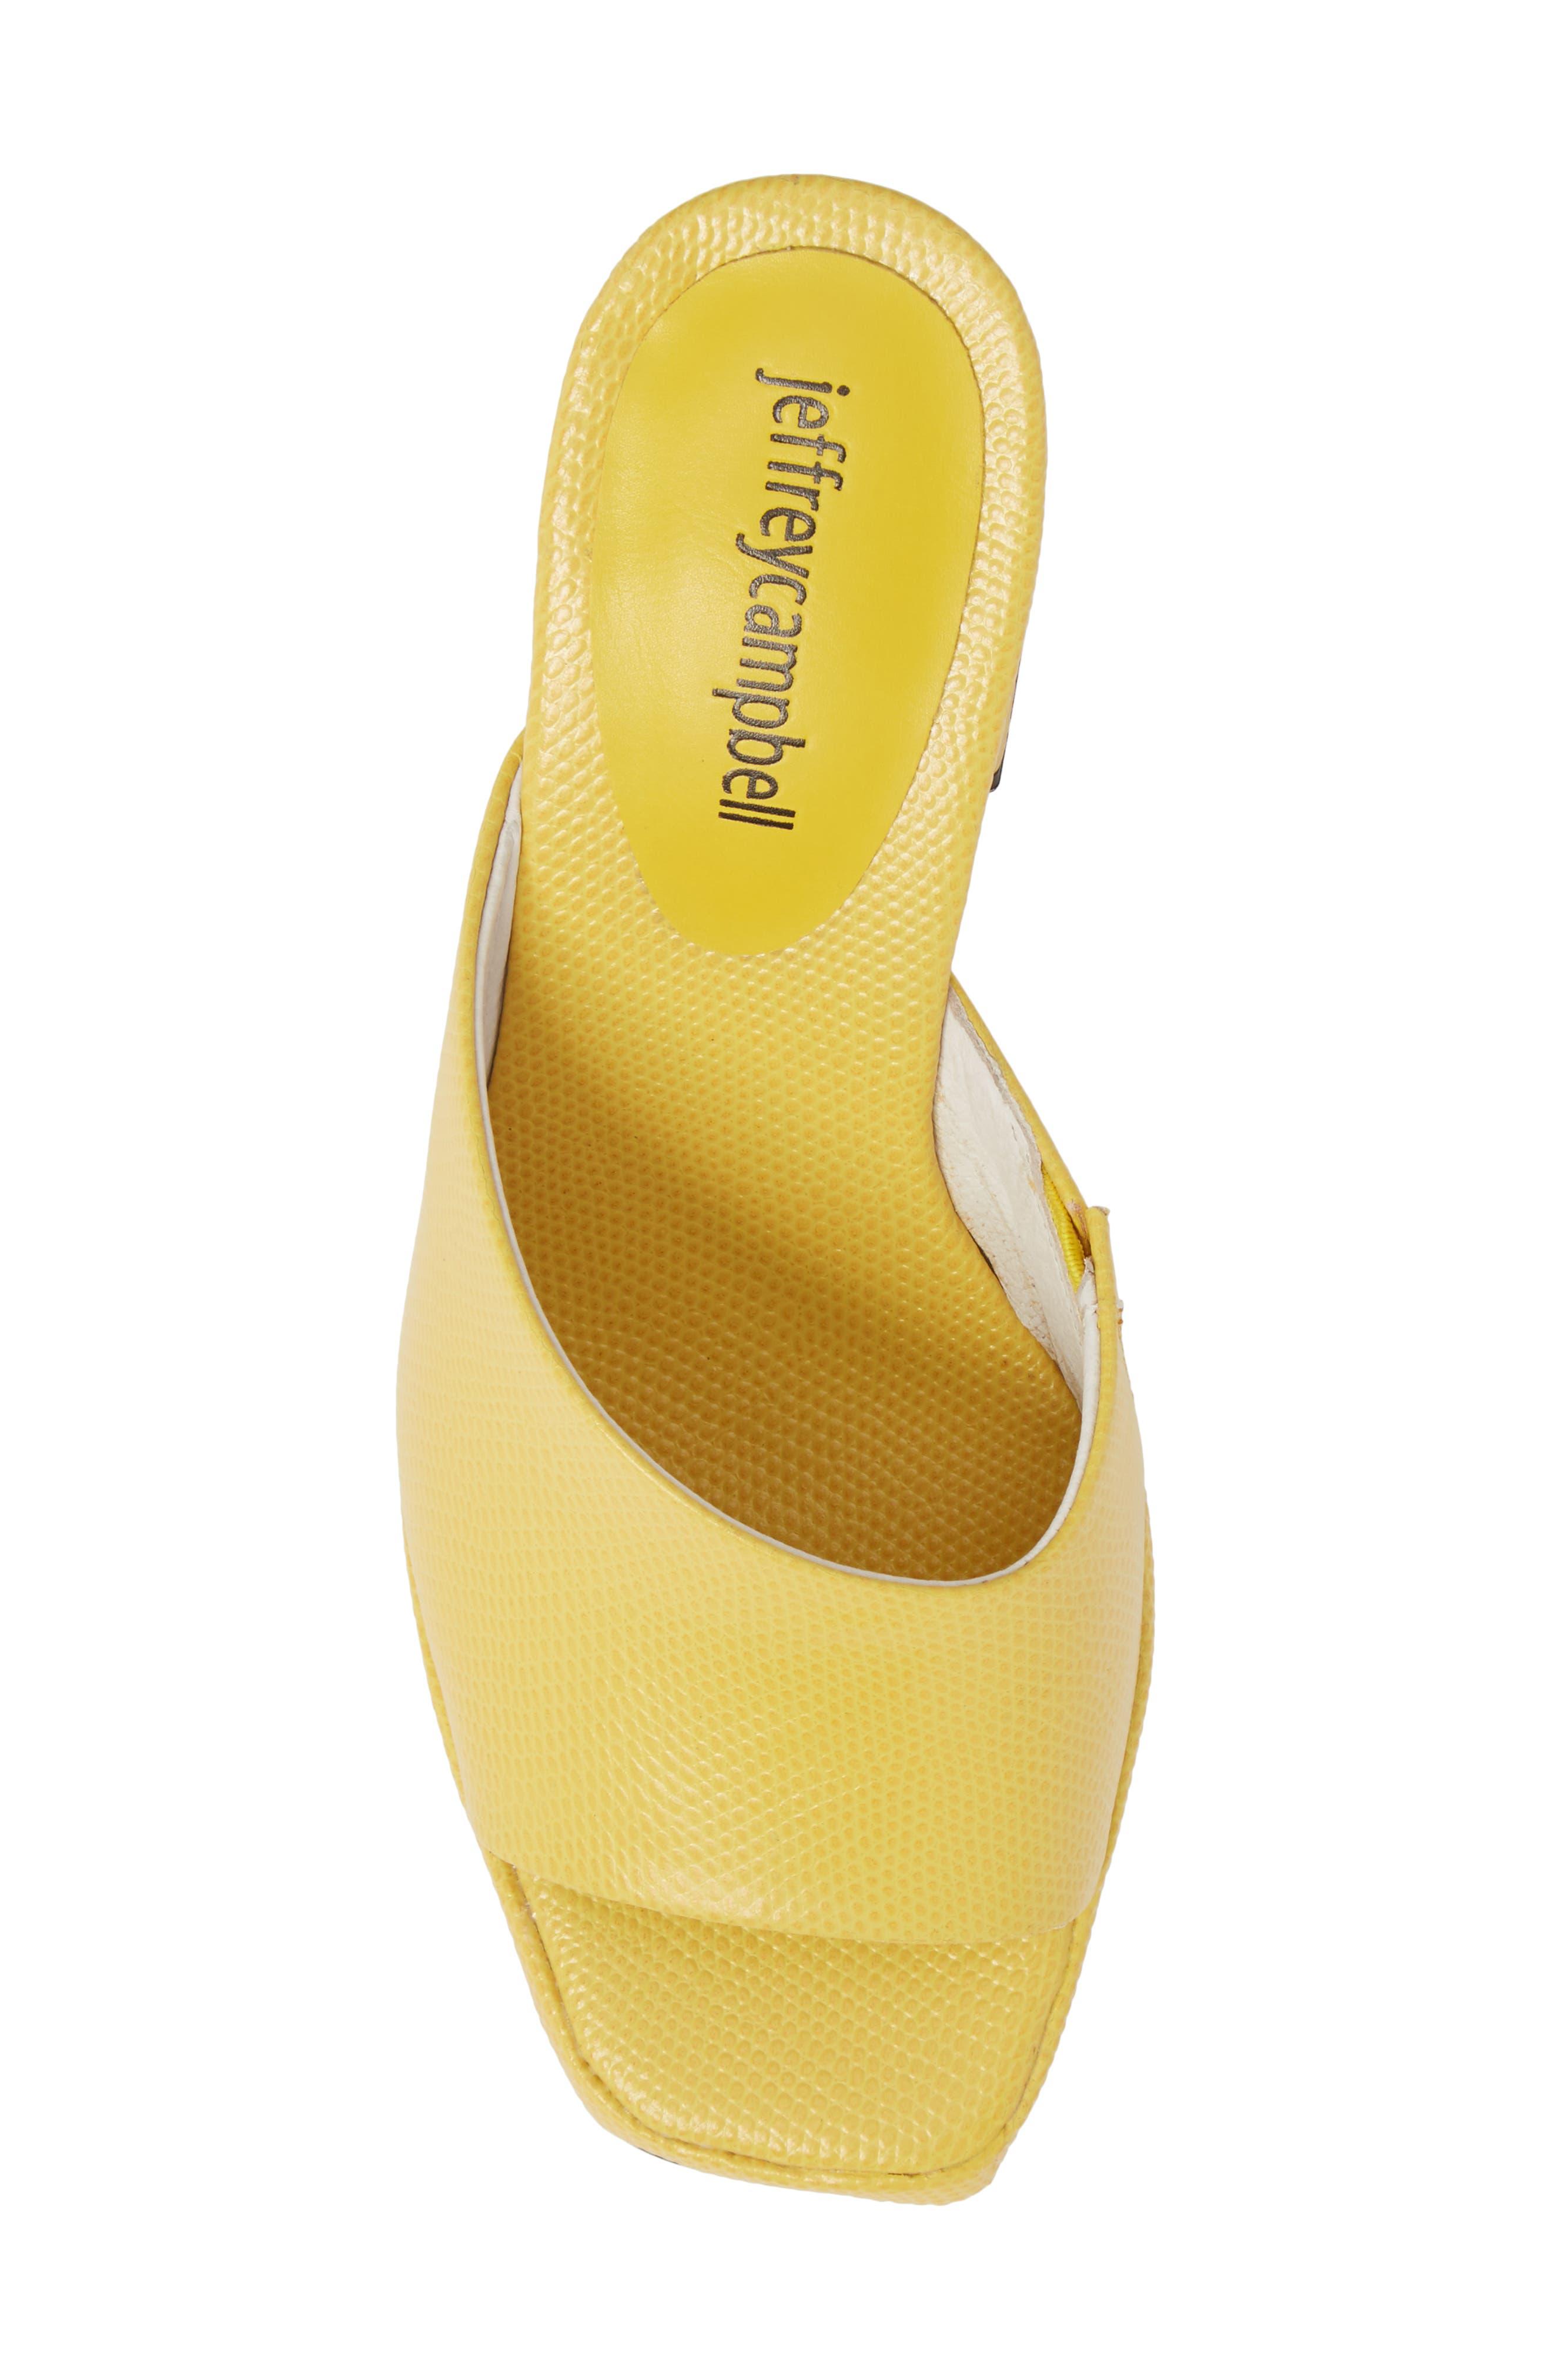 Suzuci Sandal,                             Alternate thumbnail 5, color,                             Yellow Leather